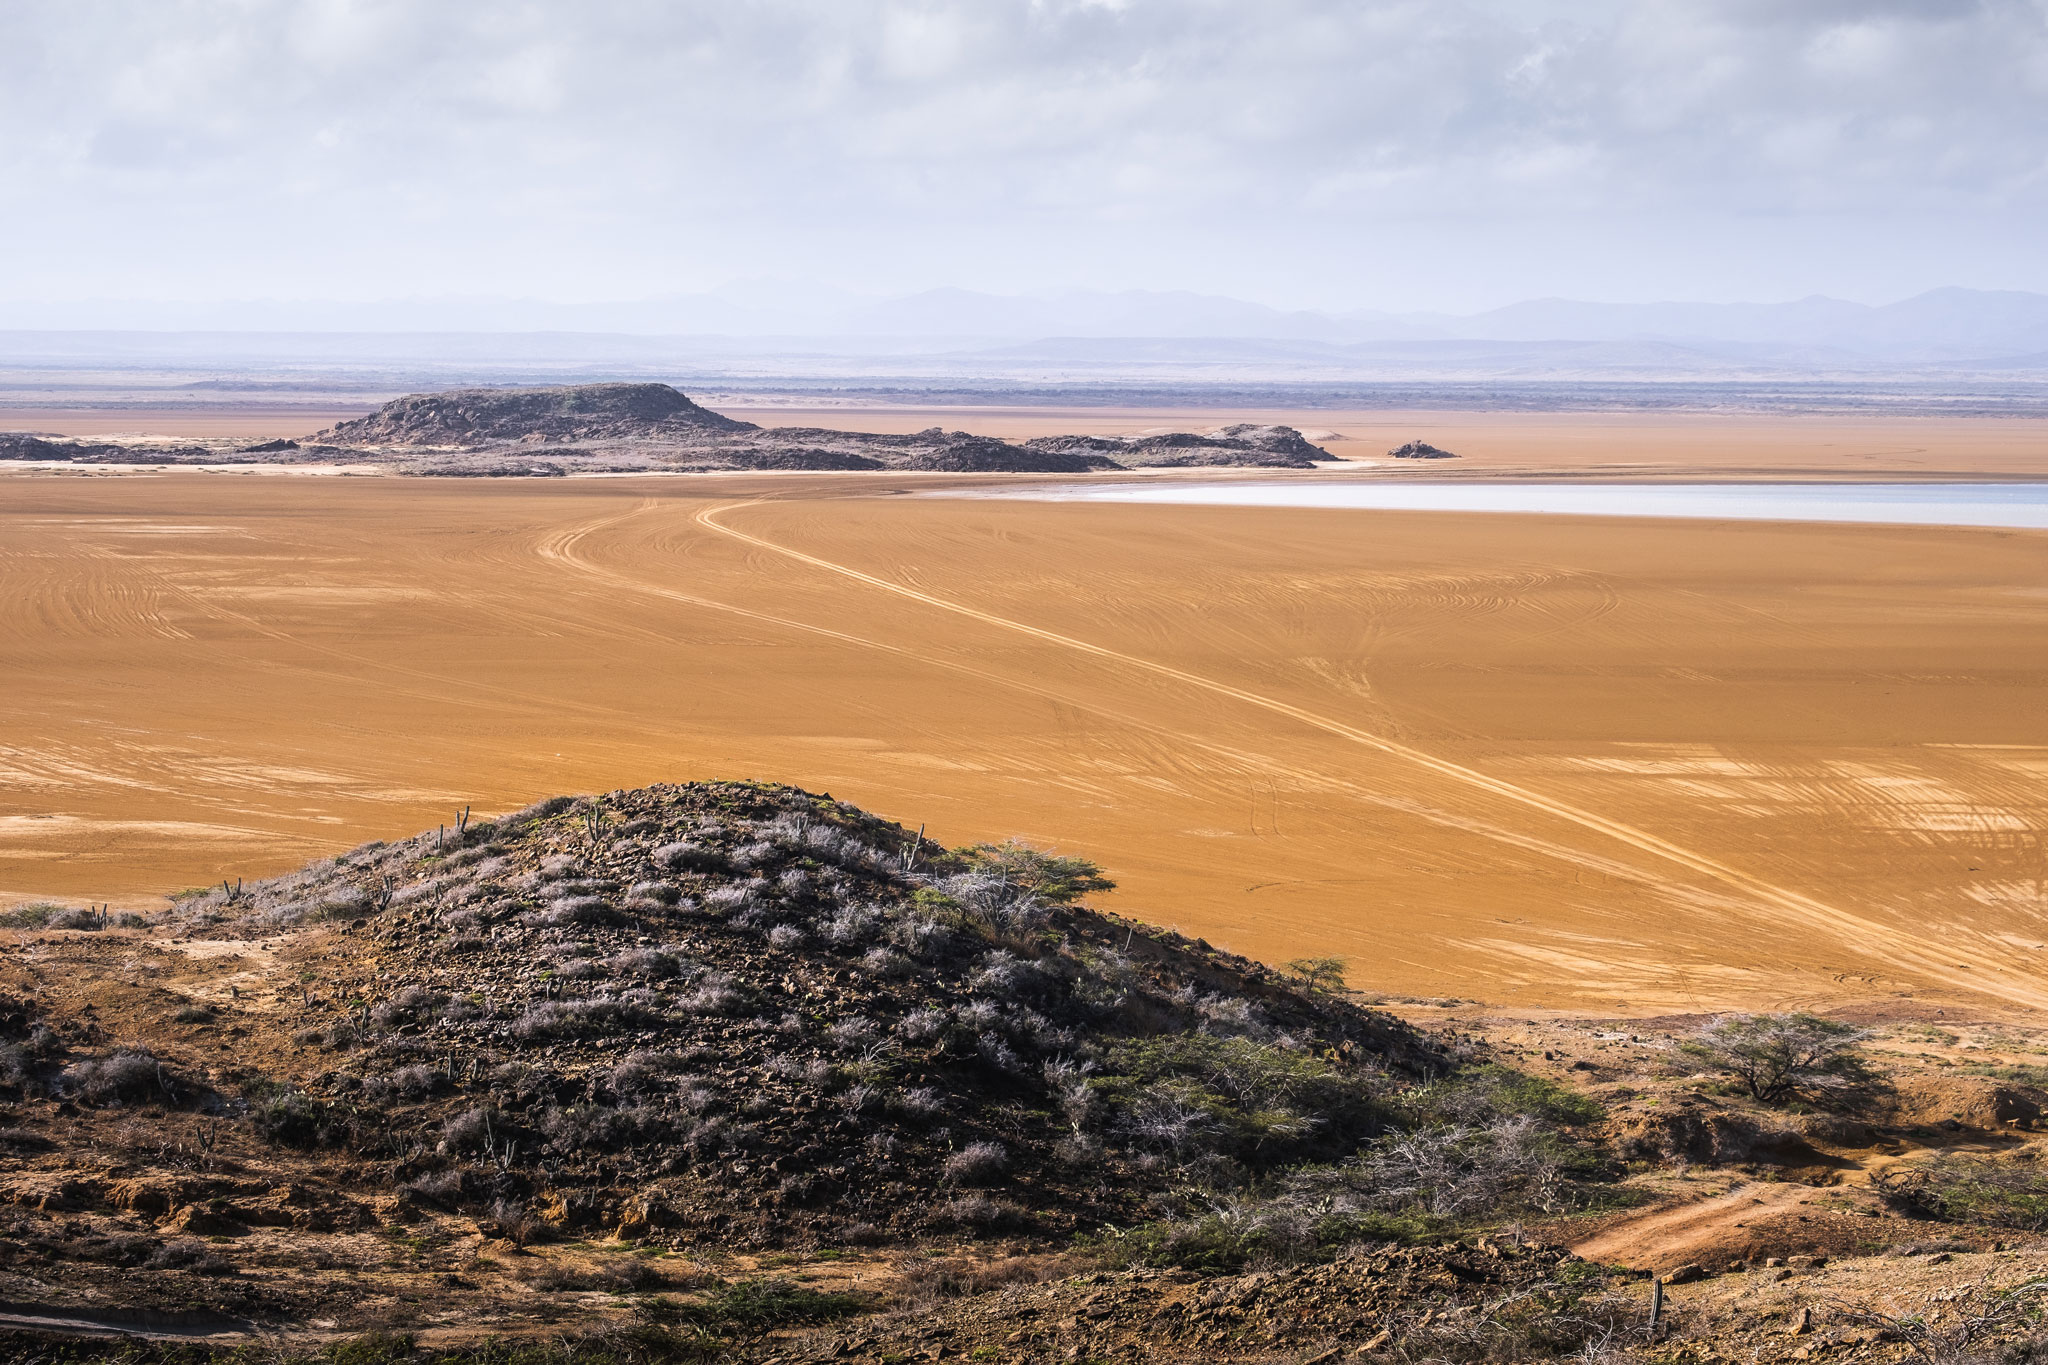 la-guajira-colombian-desert